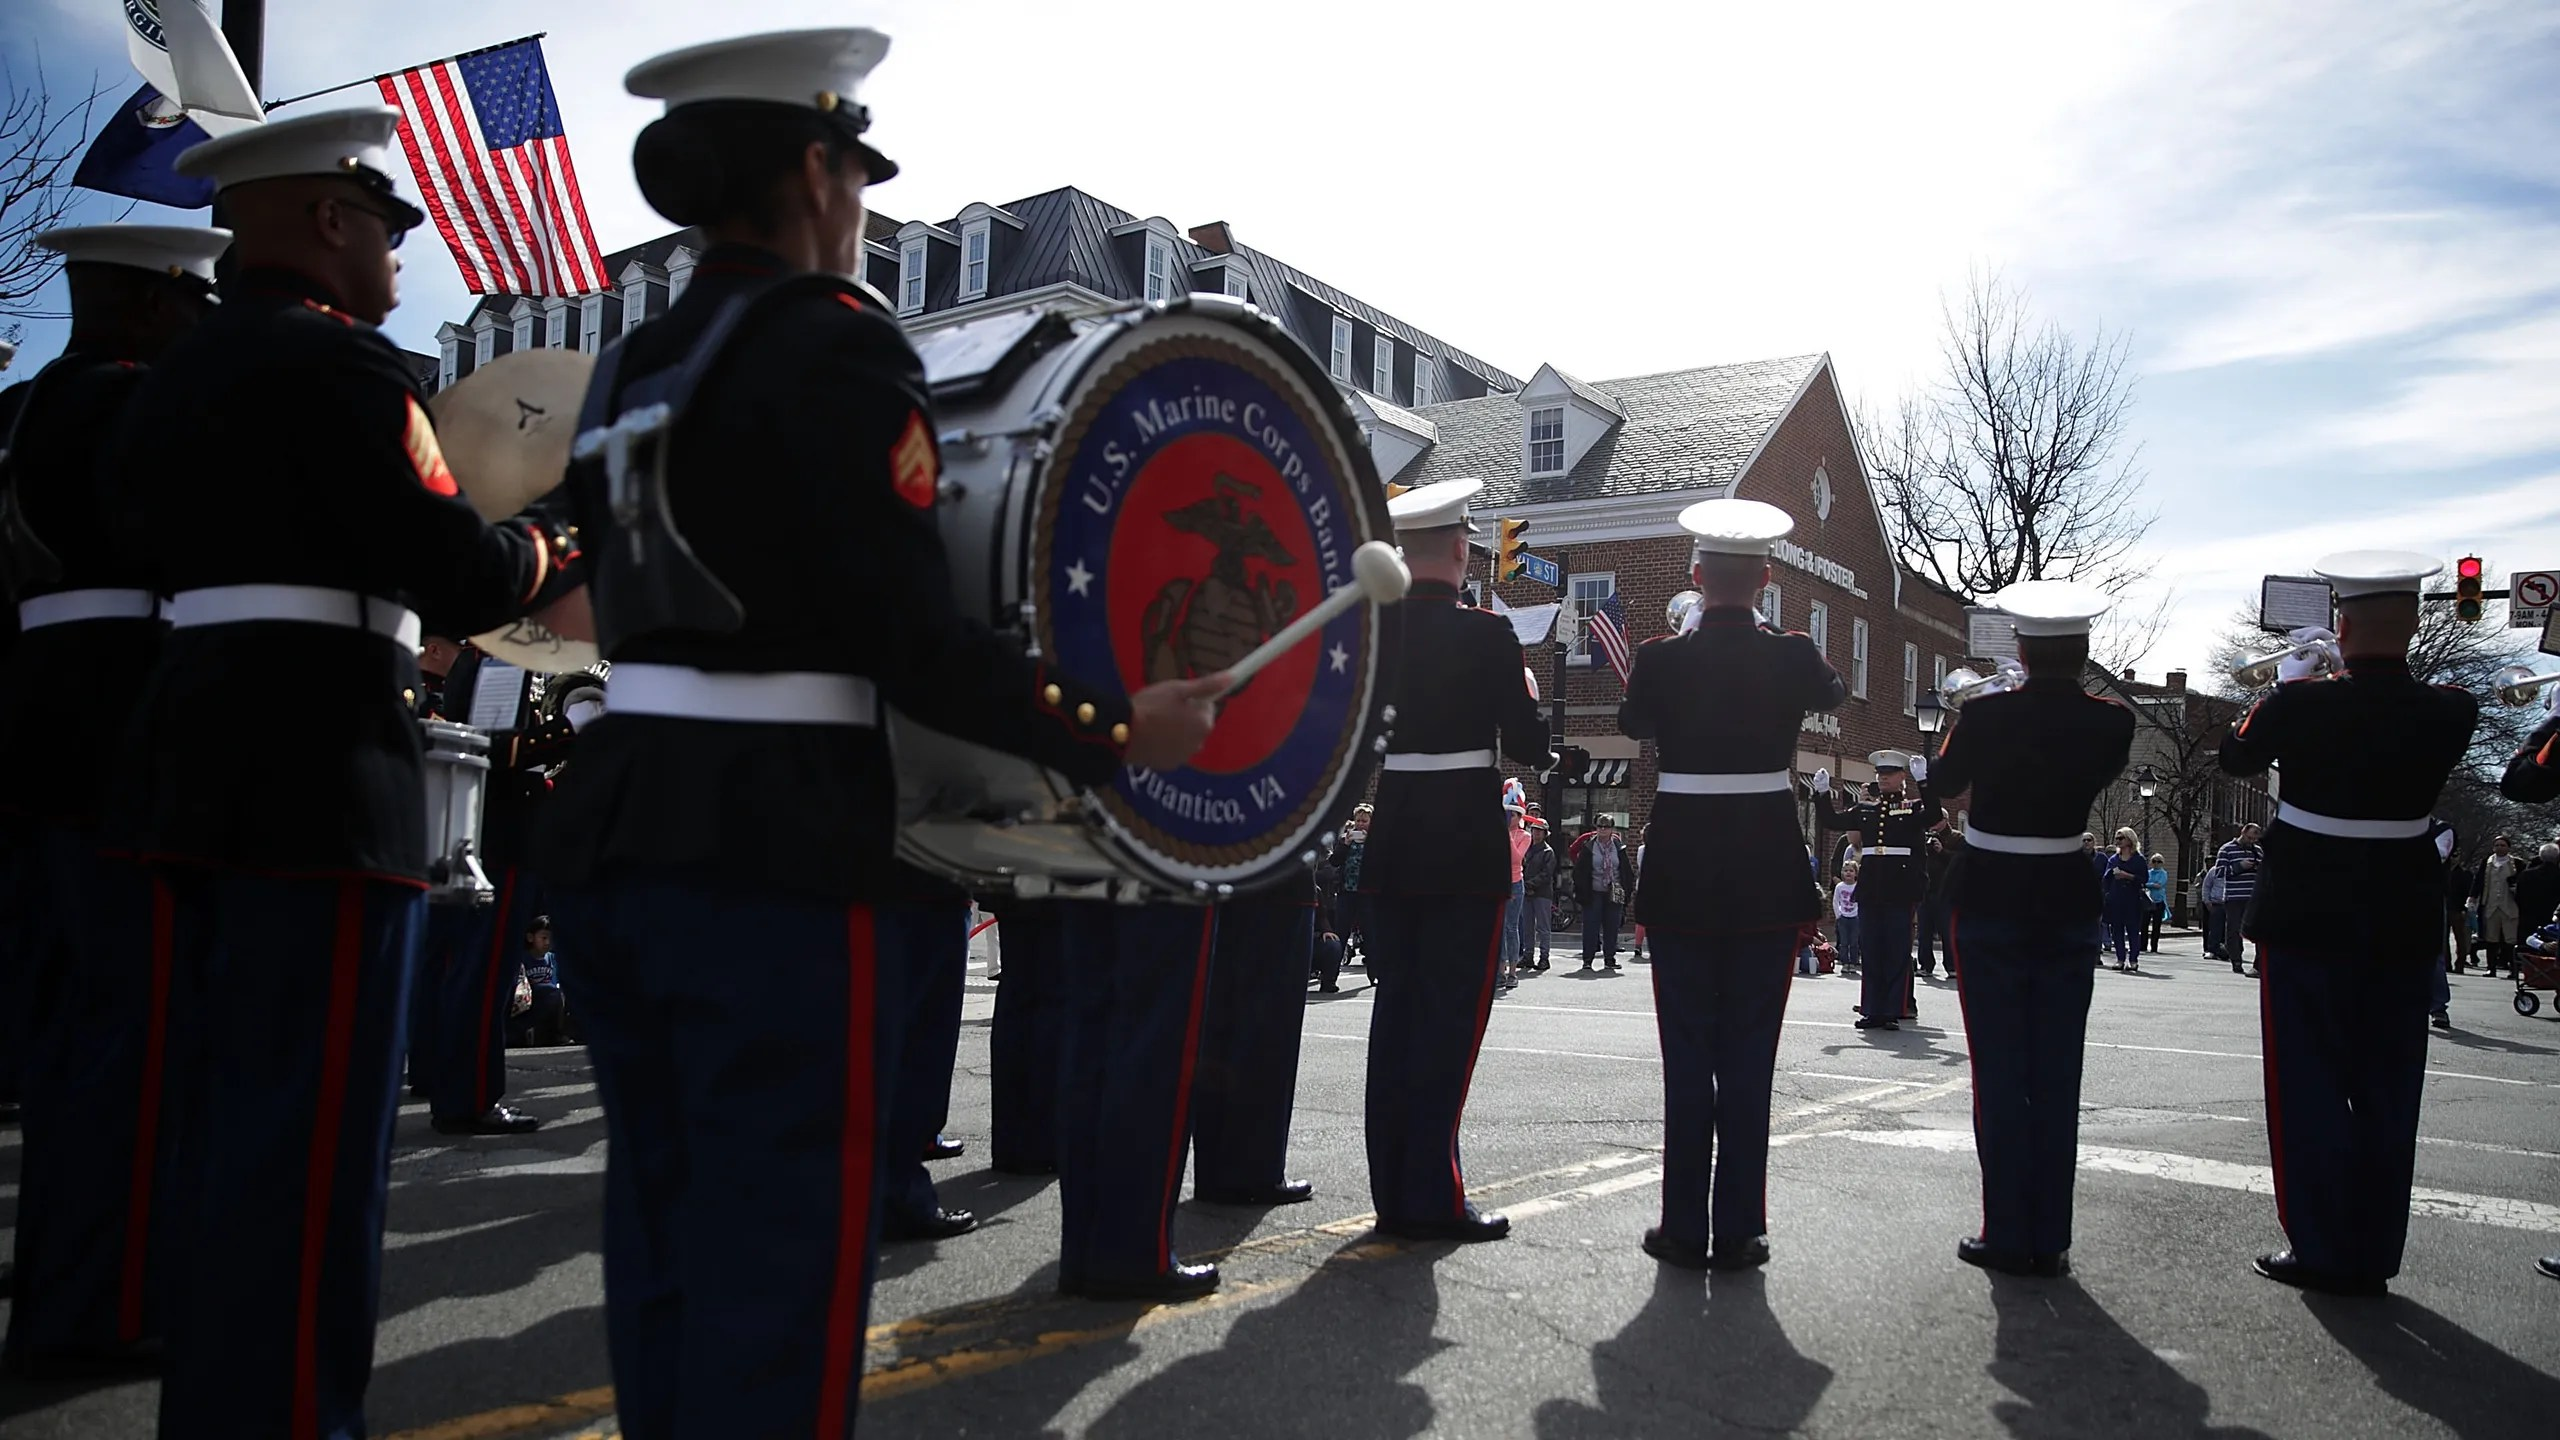 Marine Corps Makes Spreading Revenge Grounds For